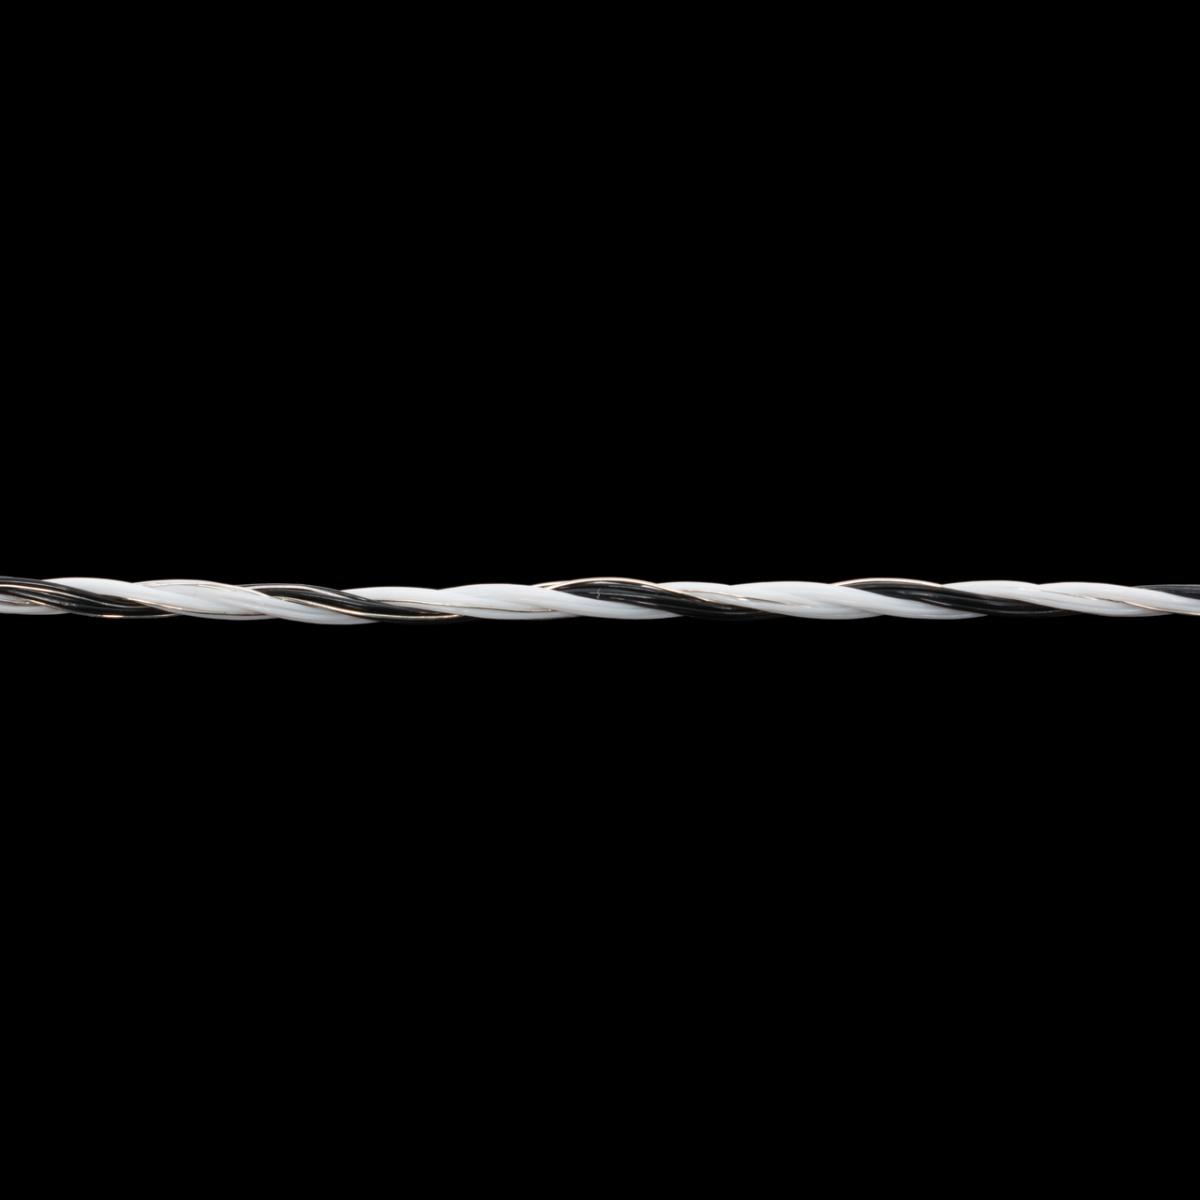 Villanypásztor zsinór - 1000m - 130kg - 0,4Ω/m